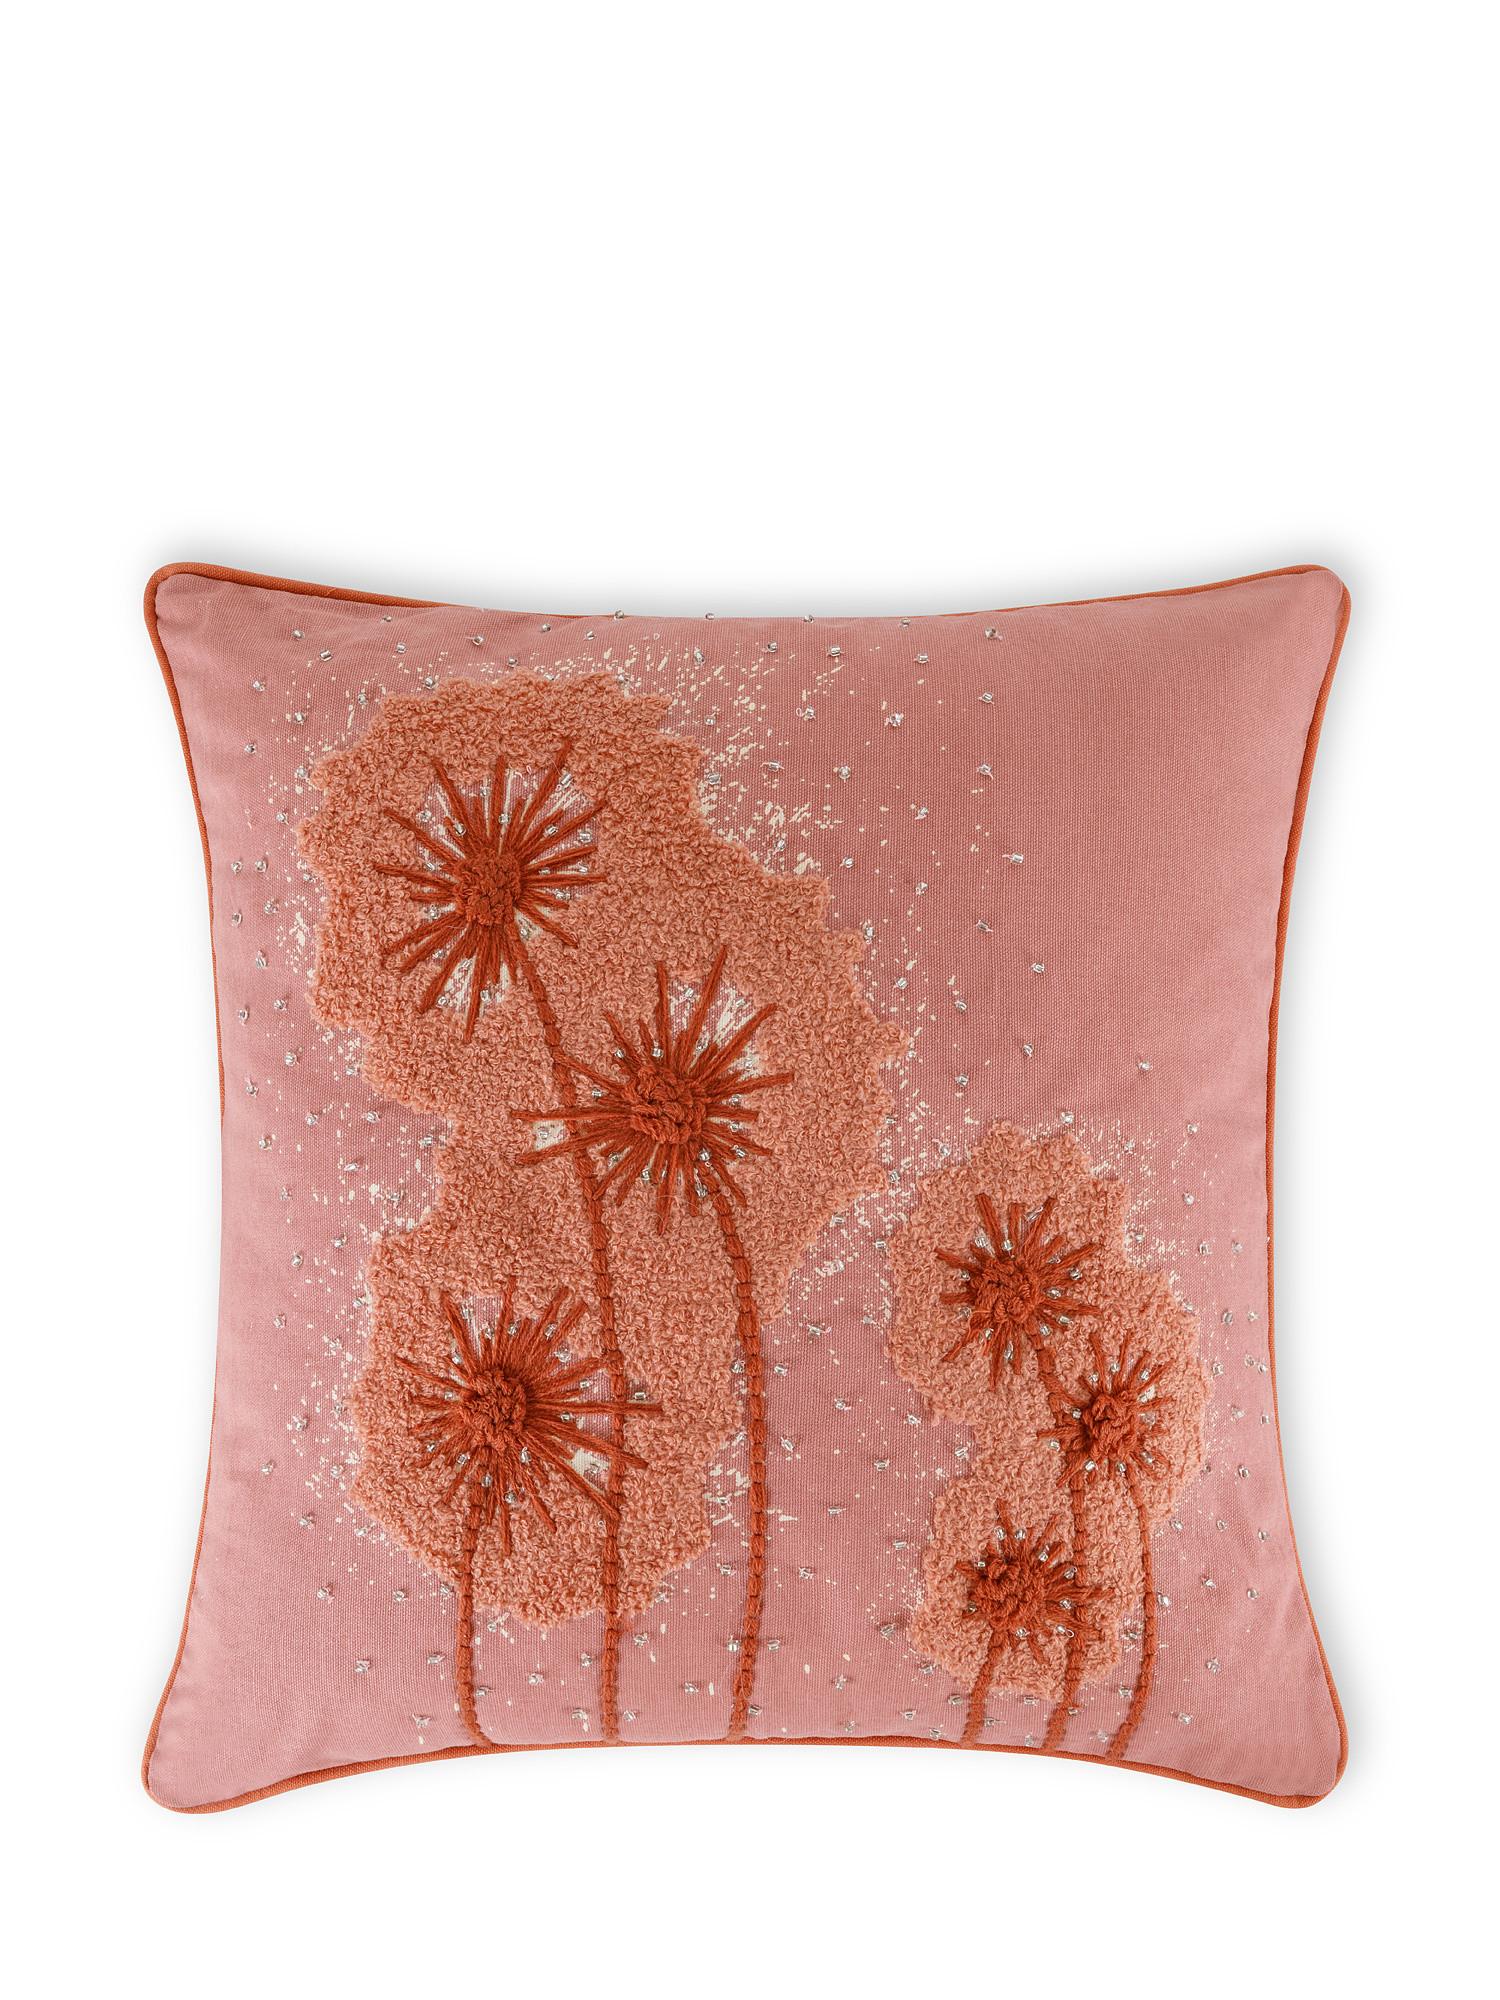 Cuscino cotone ricamo soffioni 45x45cm, Multicolor, large image number 0